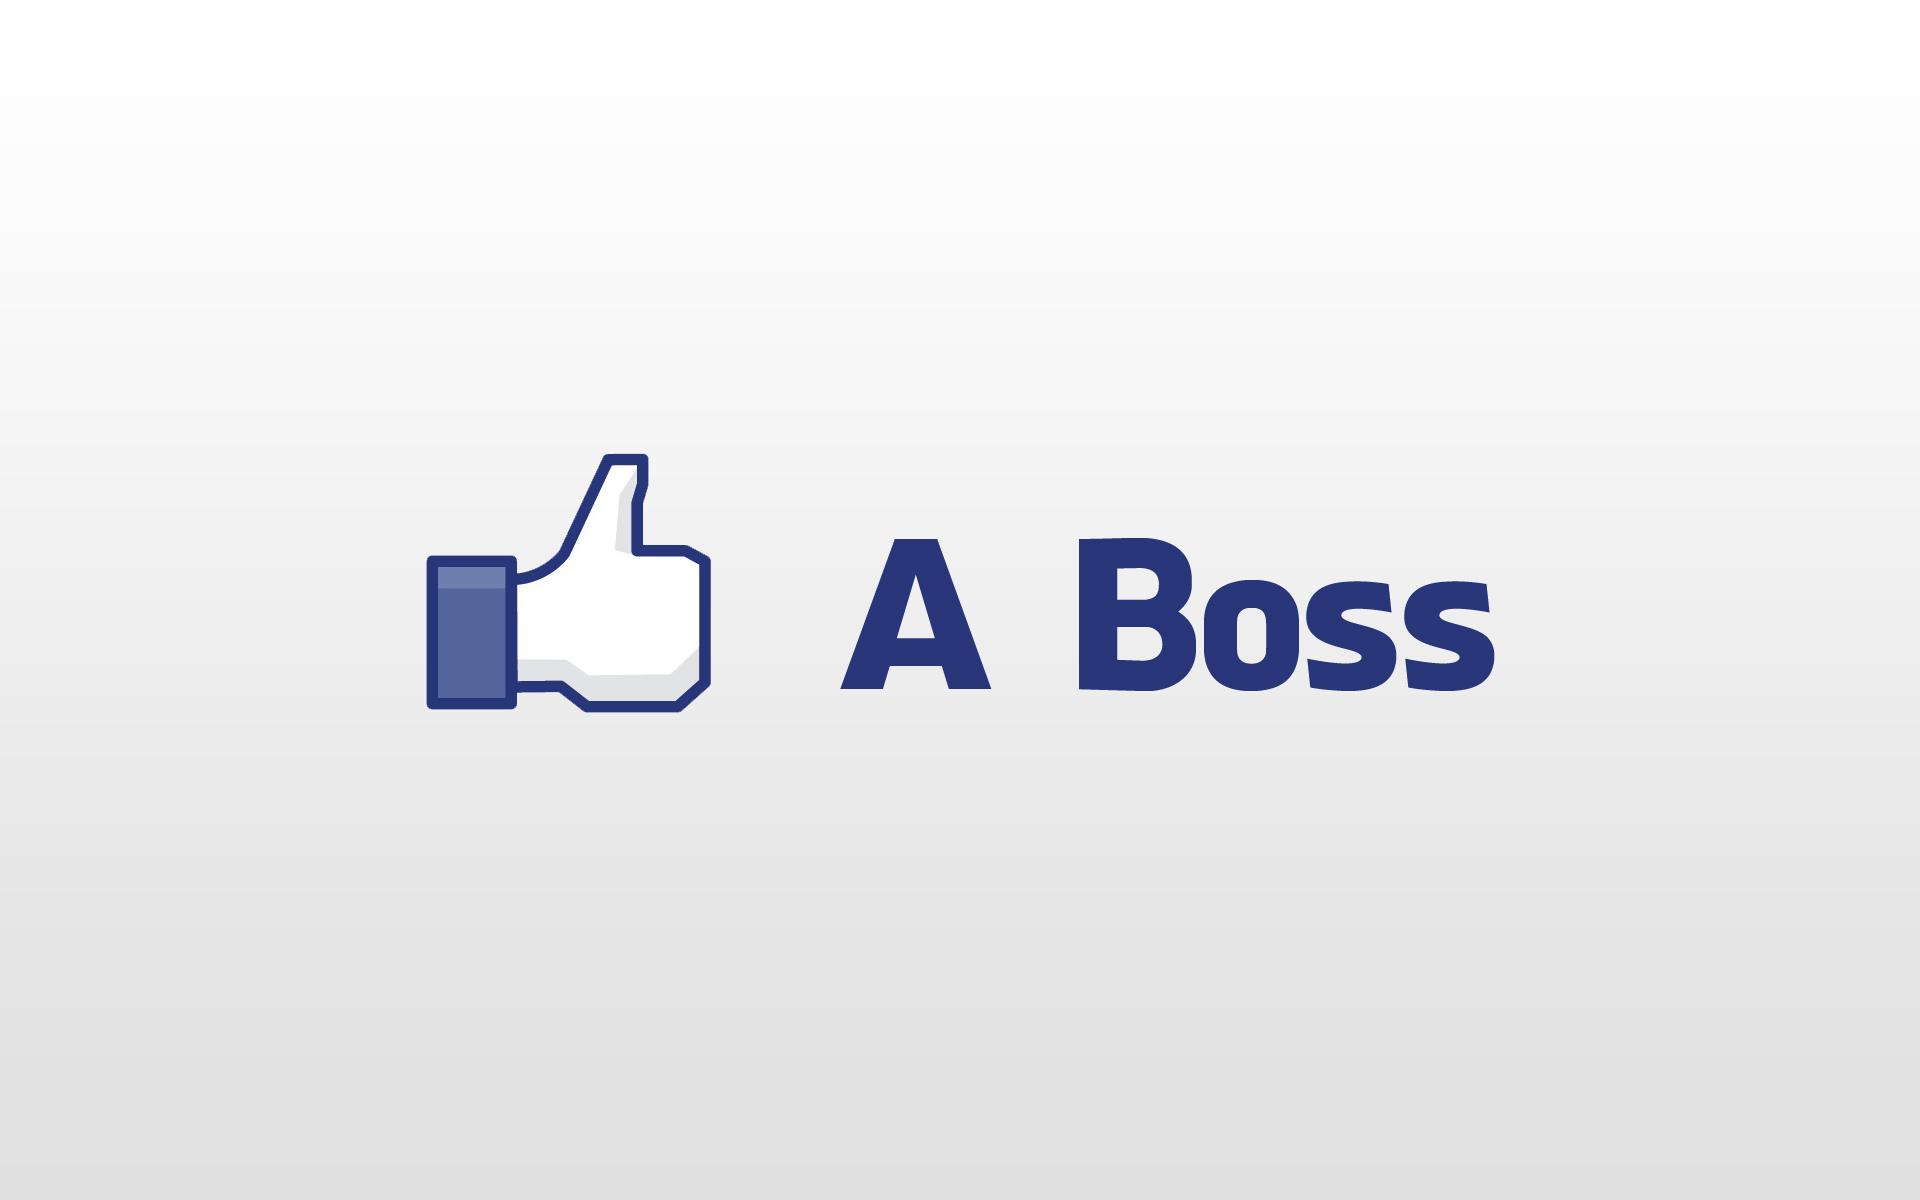 image like a boss jpg begone wiki fandom powered by wikia